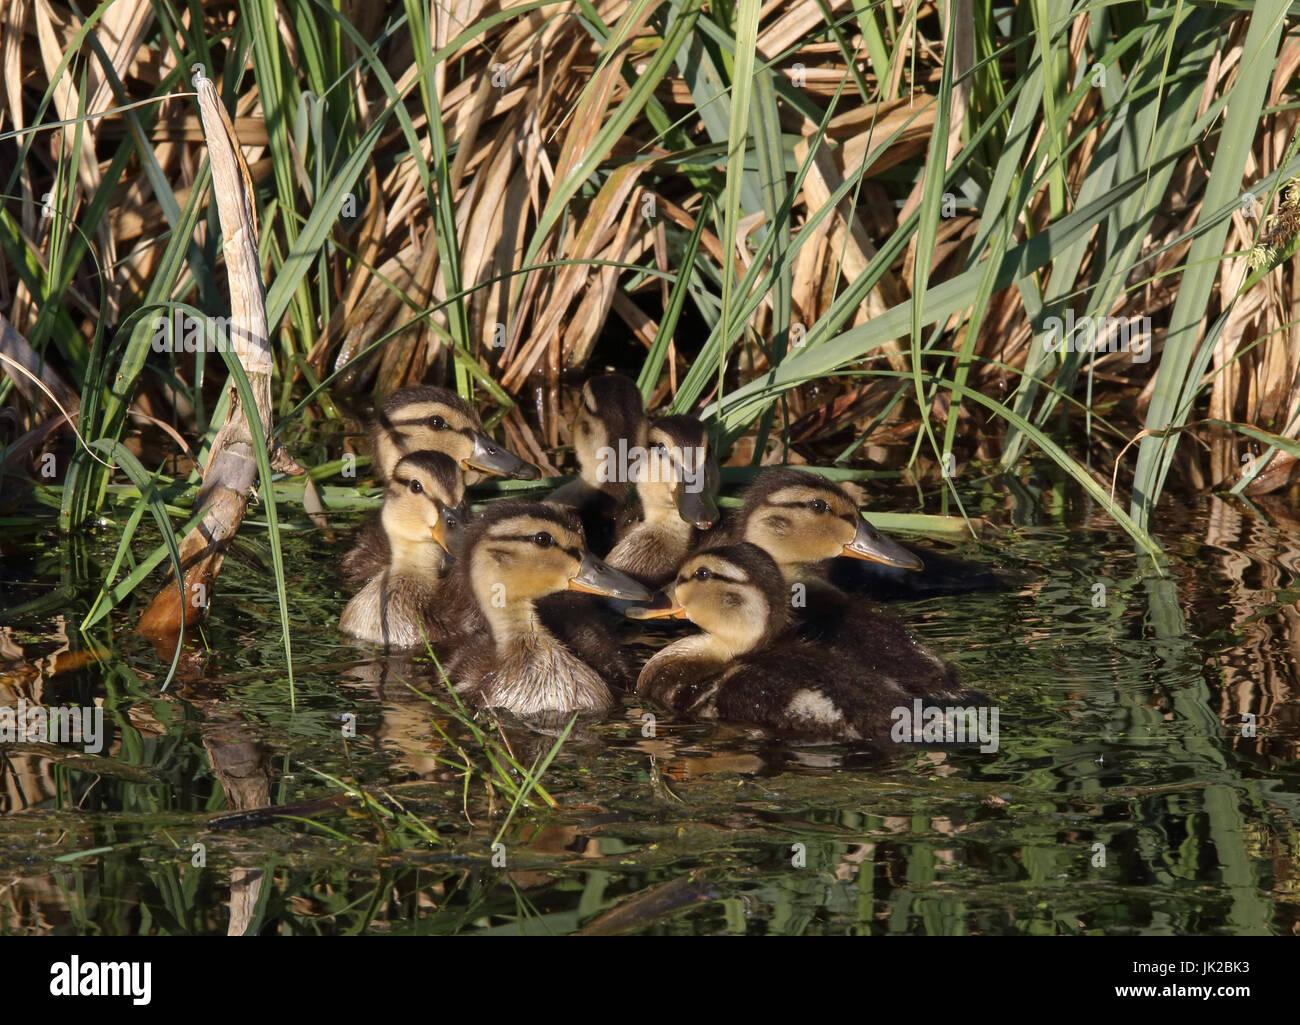 Mallard Ducklings (Anas platyrhynchos) - Stock Image